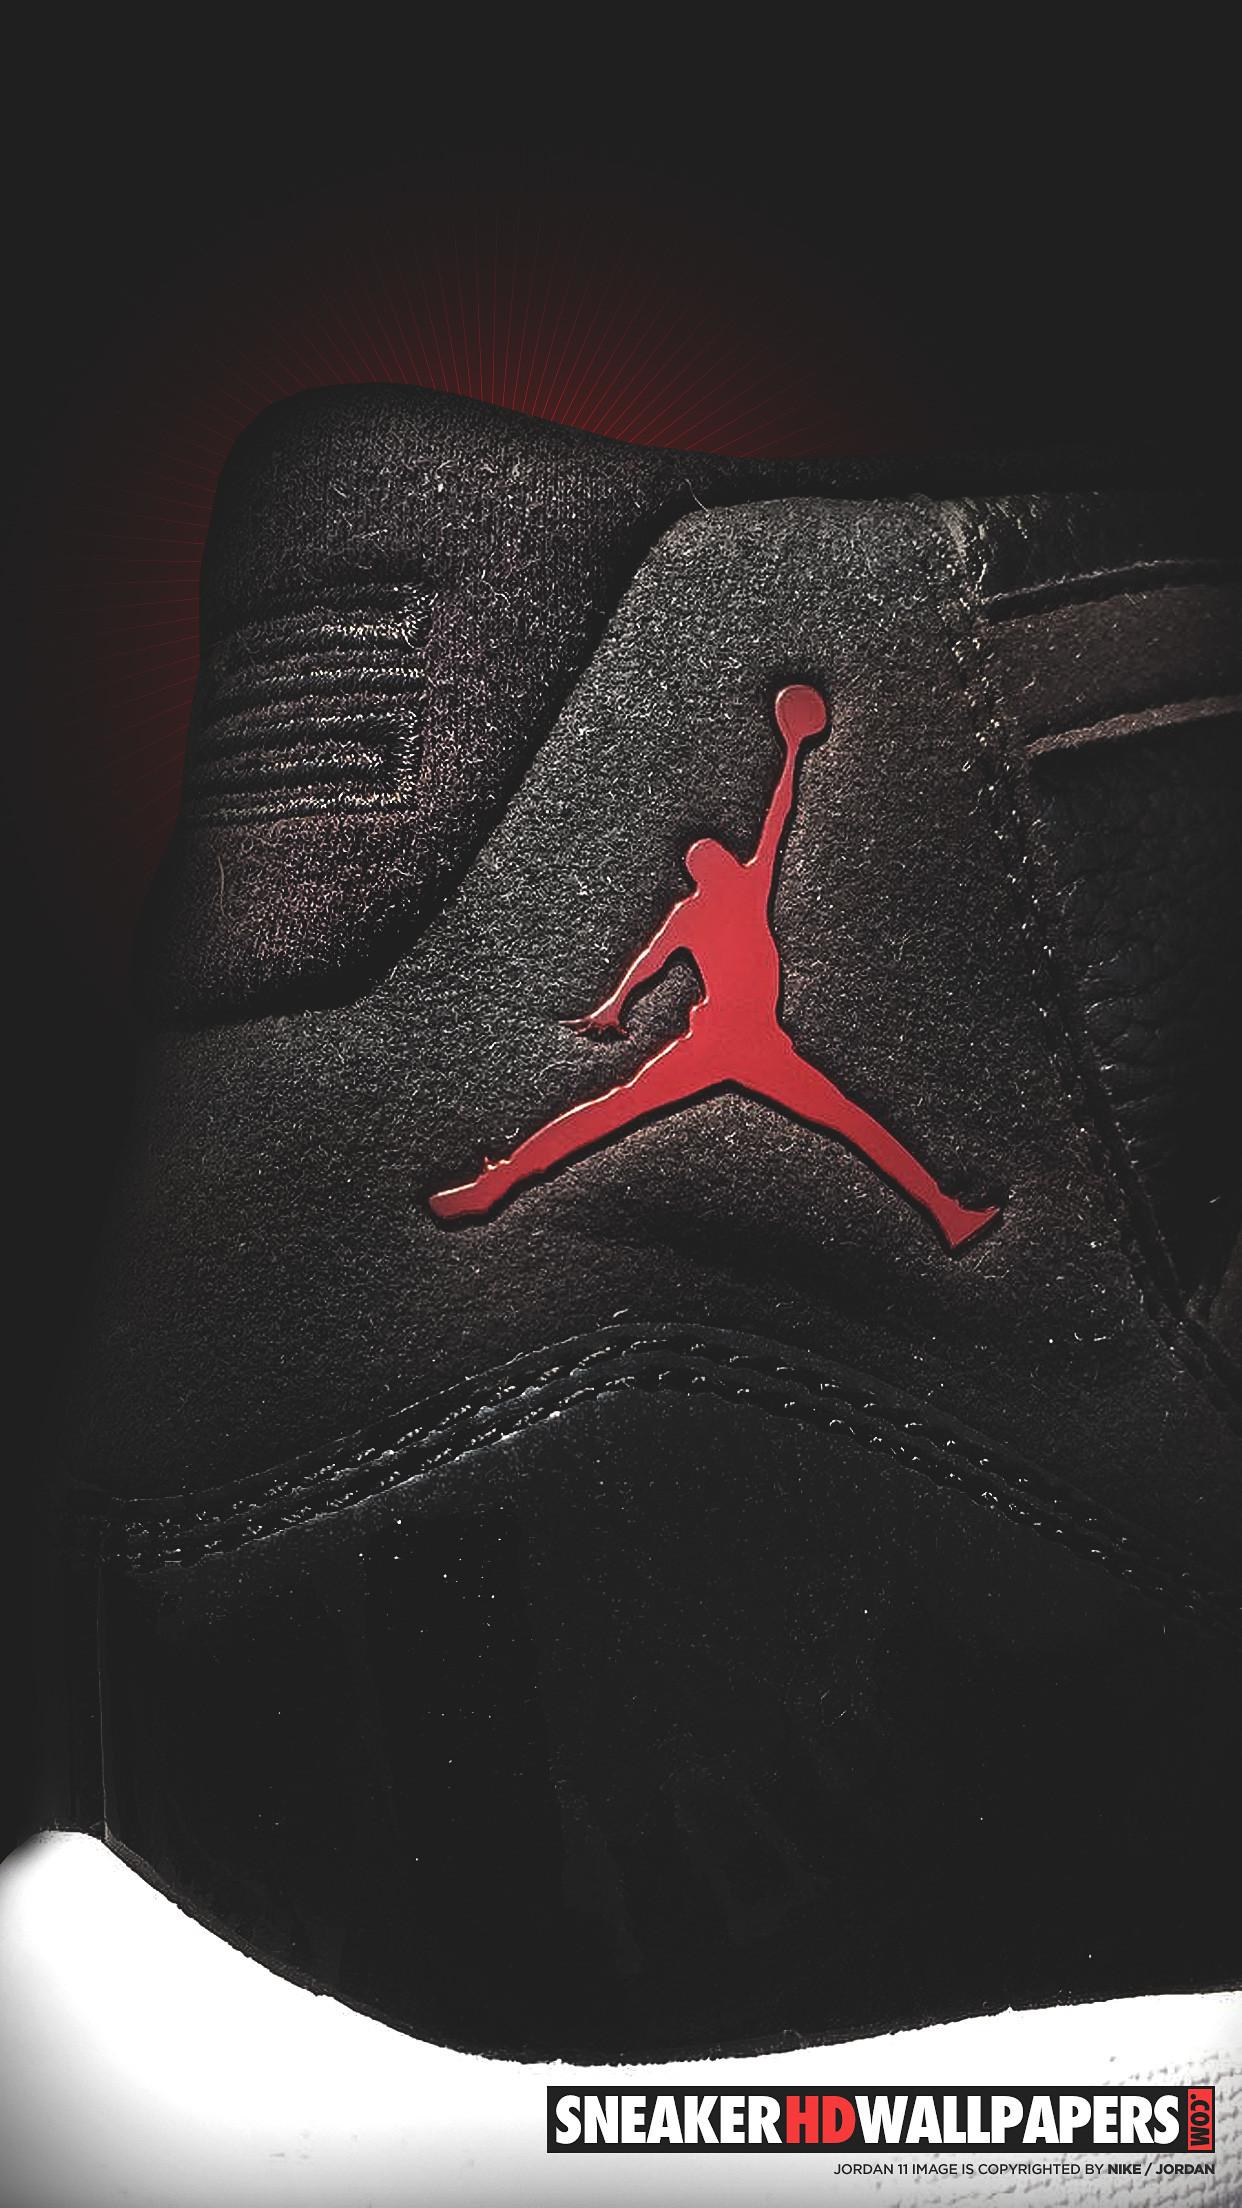 Jordan logo backgrounds 62 pictures 1920x1080 1920x1080 michael jordan background hd voltagebd Choice Image